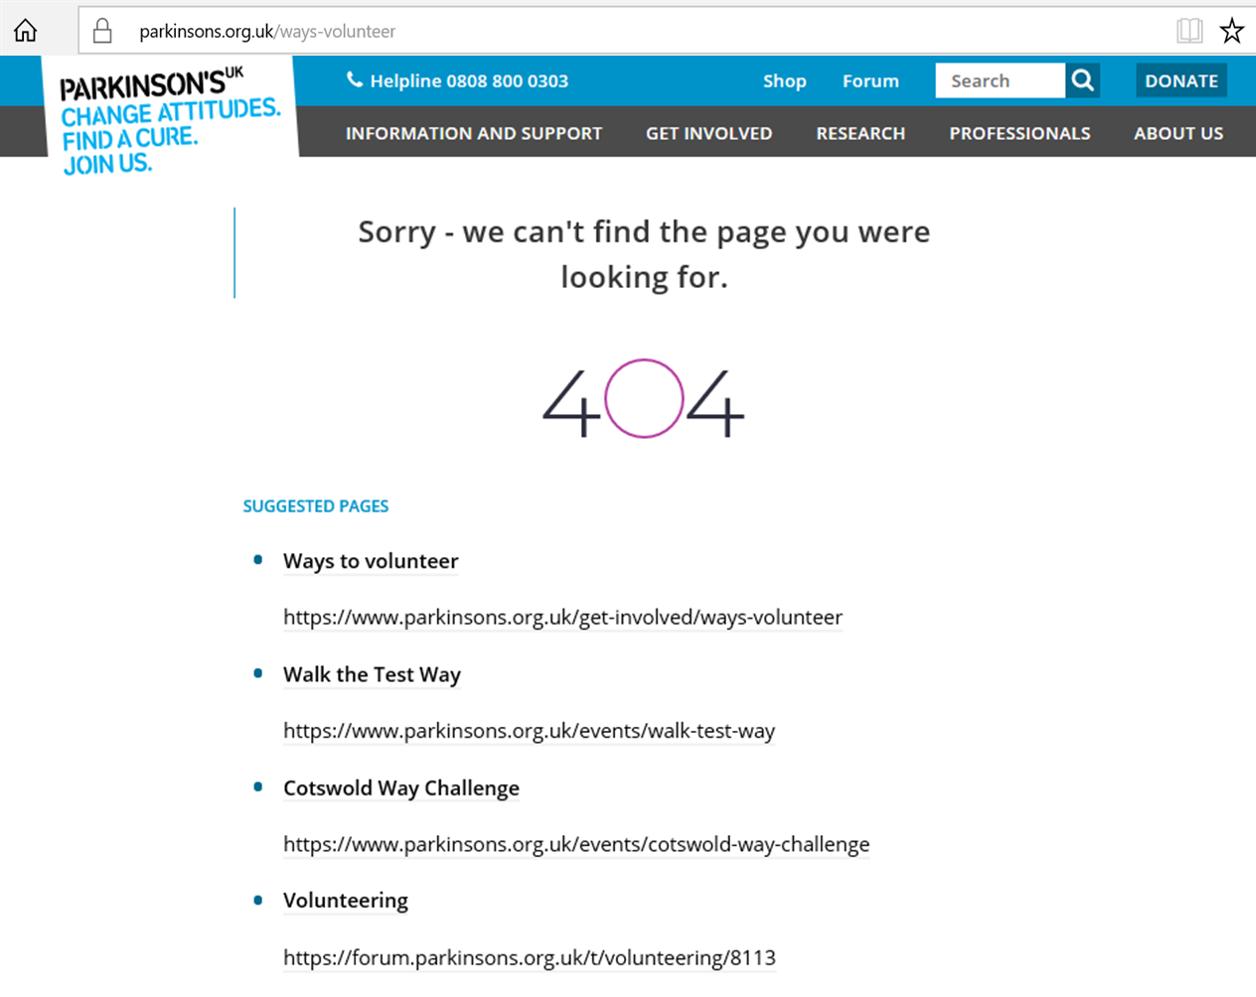 intelligent-404s-parkinsons